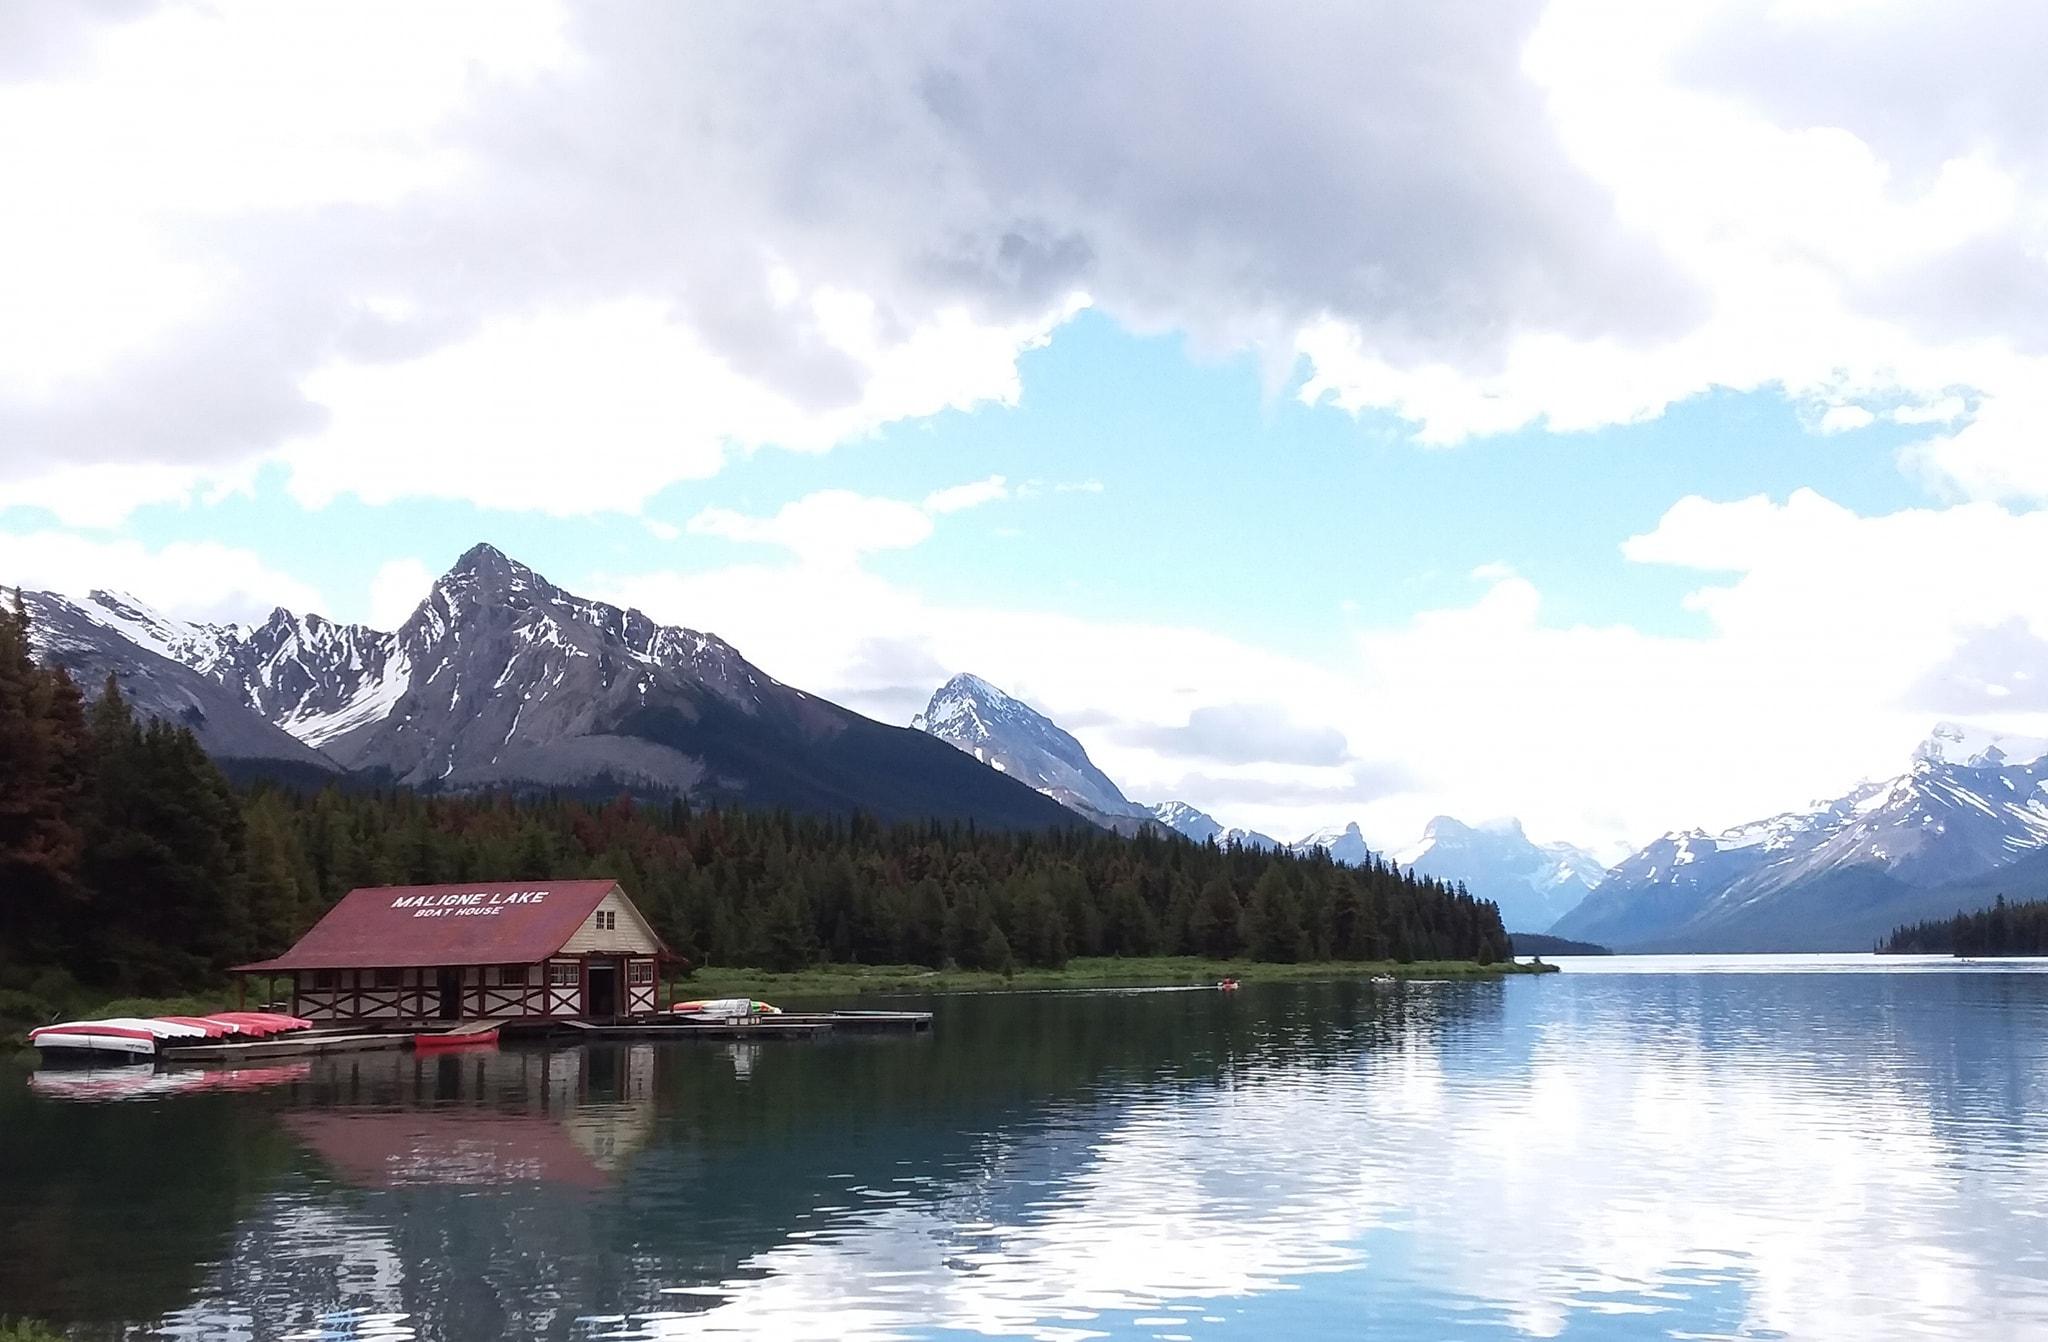 voyager vers l'ouest canadien